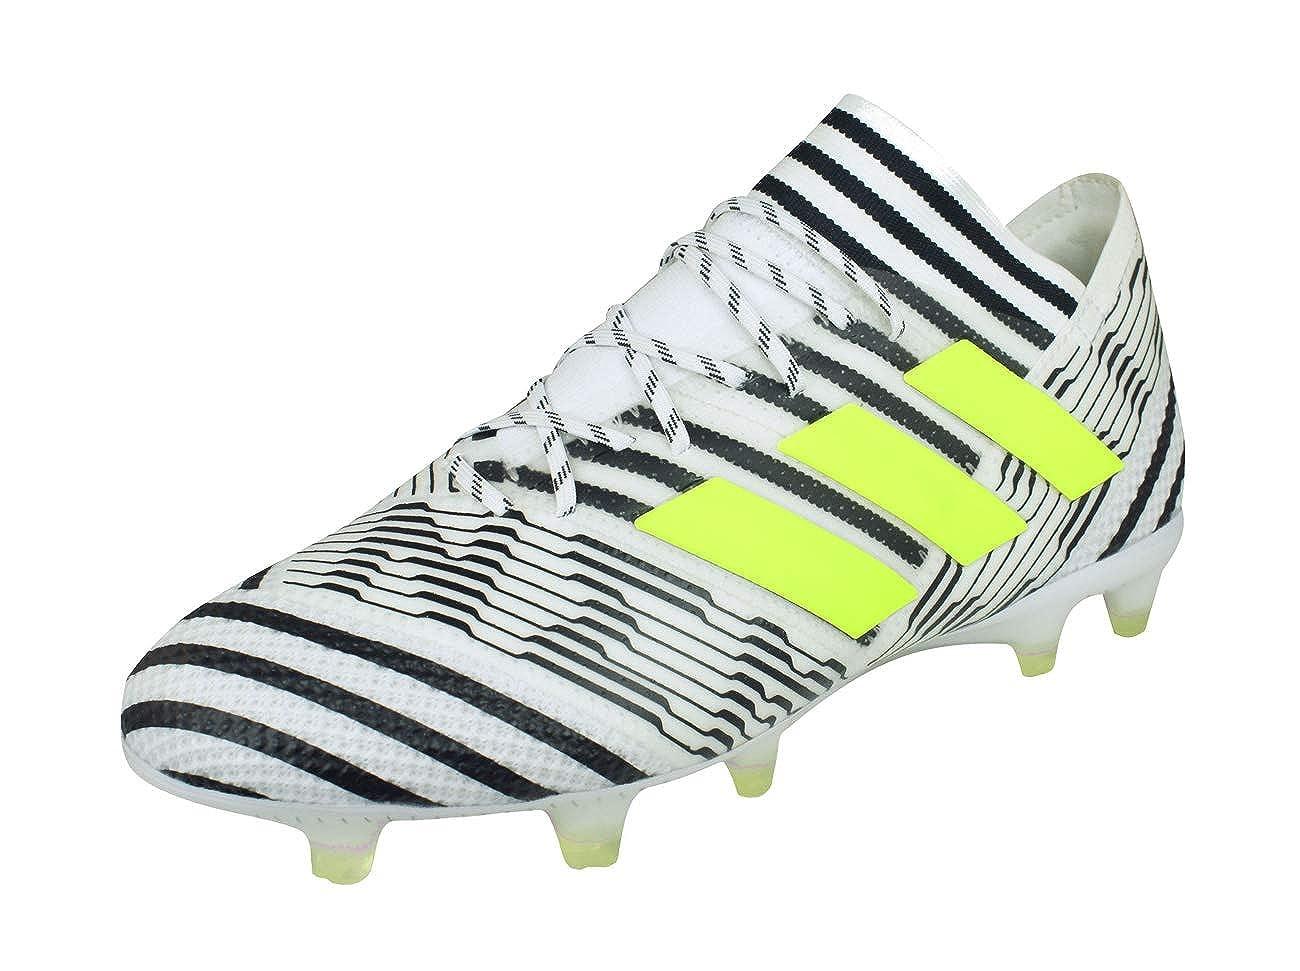 MultiCouleure - Blanc Noir (Ftwbla Amasol Negbas) 44 EU adidas Nemeziz 17.1 FG, Chaussures de Football Homme